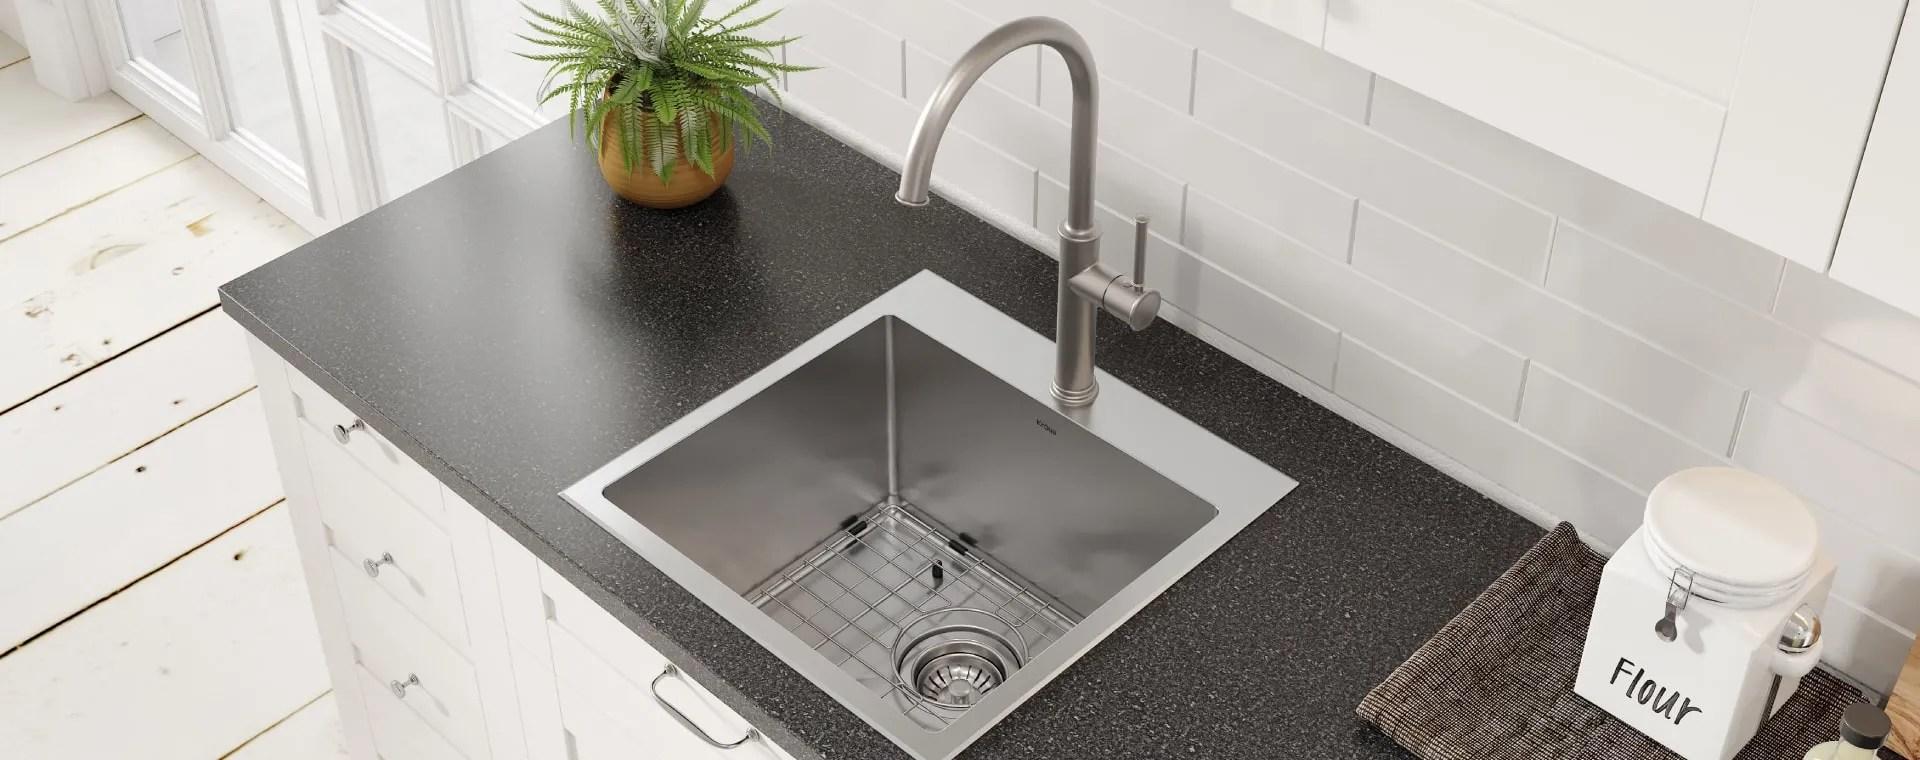 kraus usa bar faucets kitchens